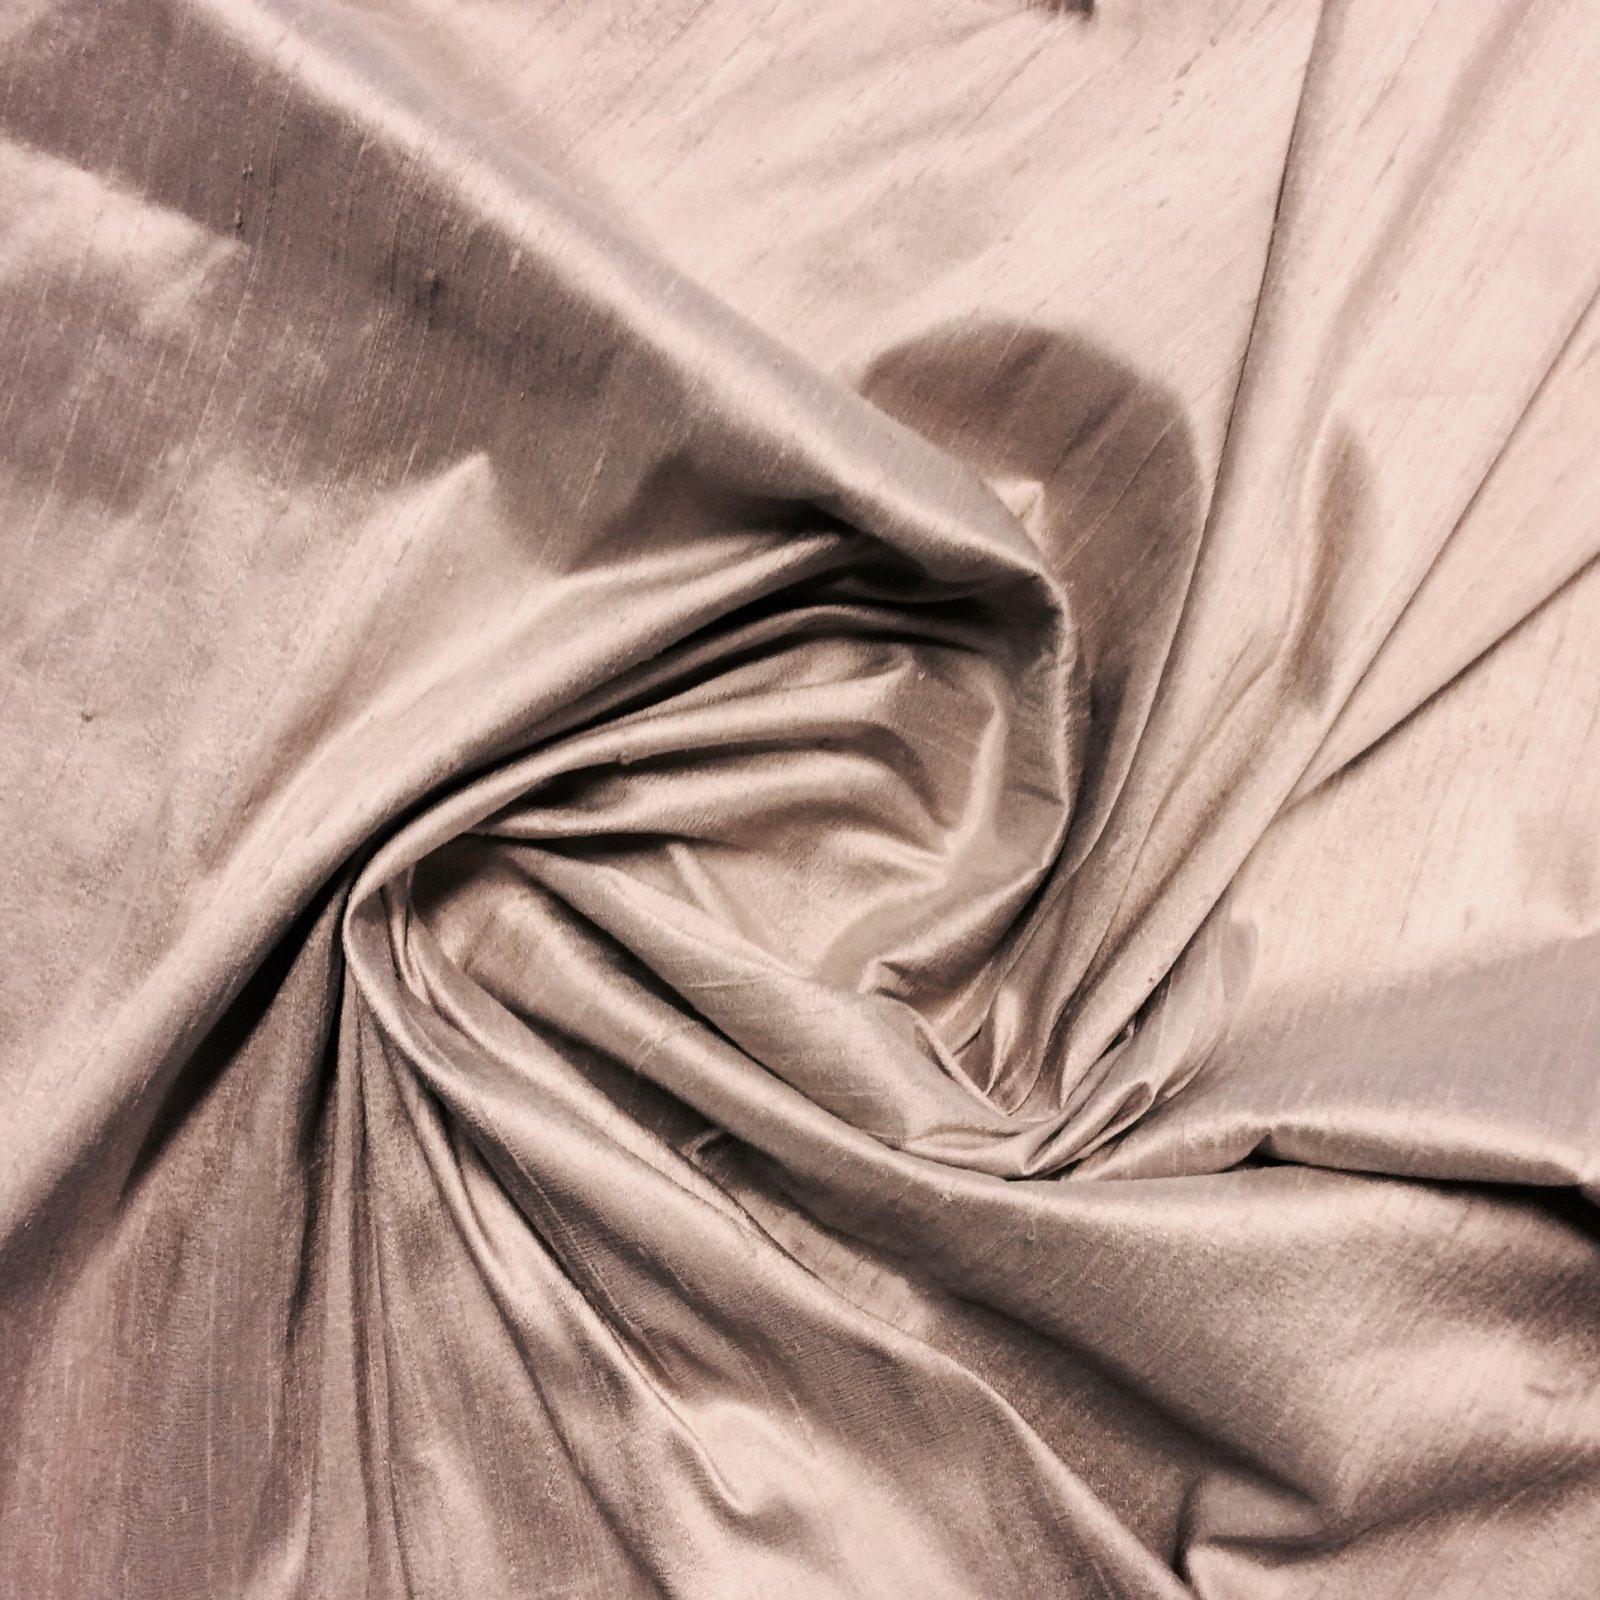 SILK Lavender Taupe Tan Exotic Hand Woven Dupioni 100% Silk Fabric Drapery Fabric BTY SHW006